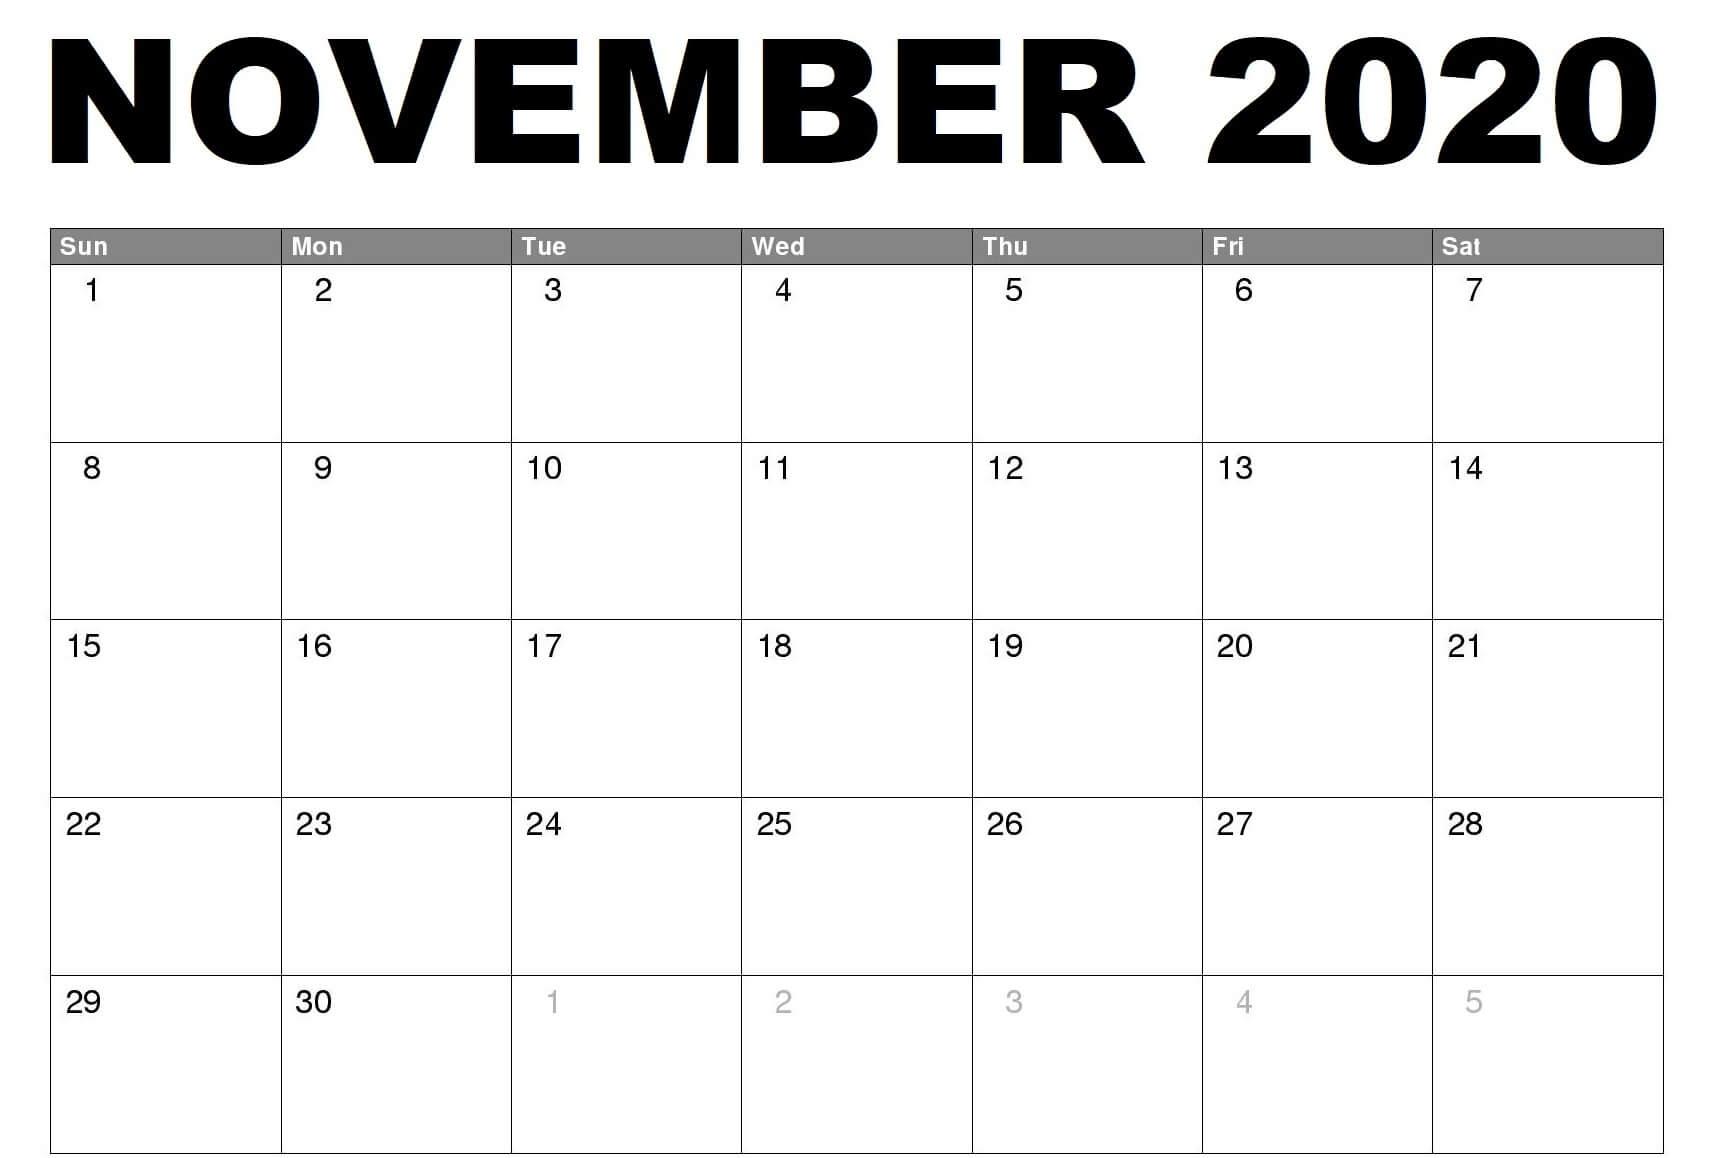 2020 Fillable November Calendar Printable Editable Inside Print Calendar January 2022 Fillable Lines